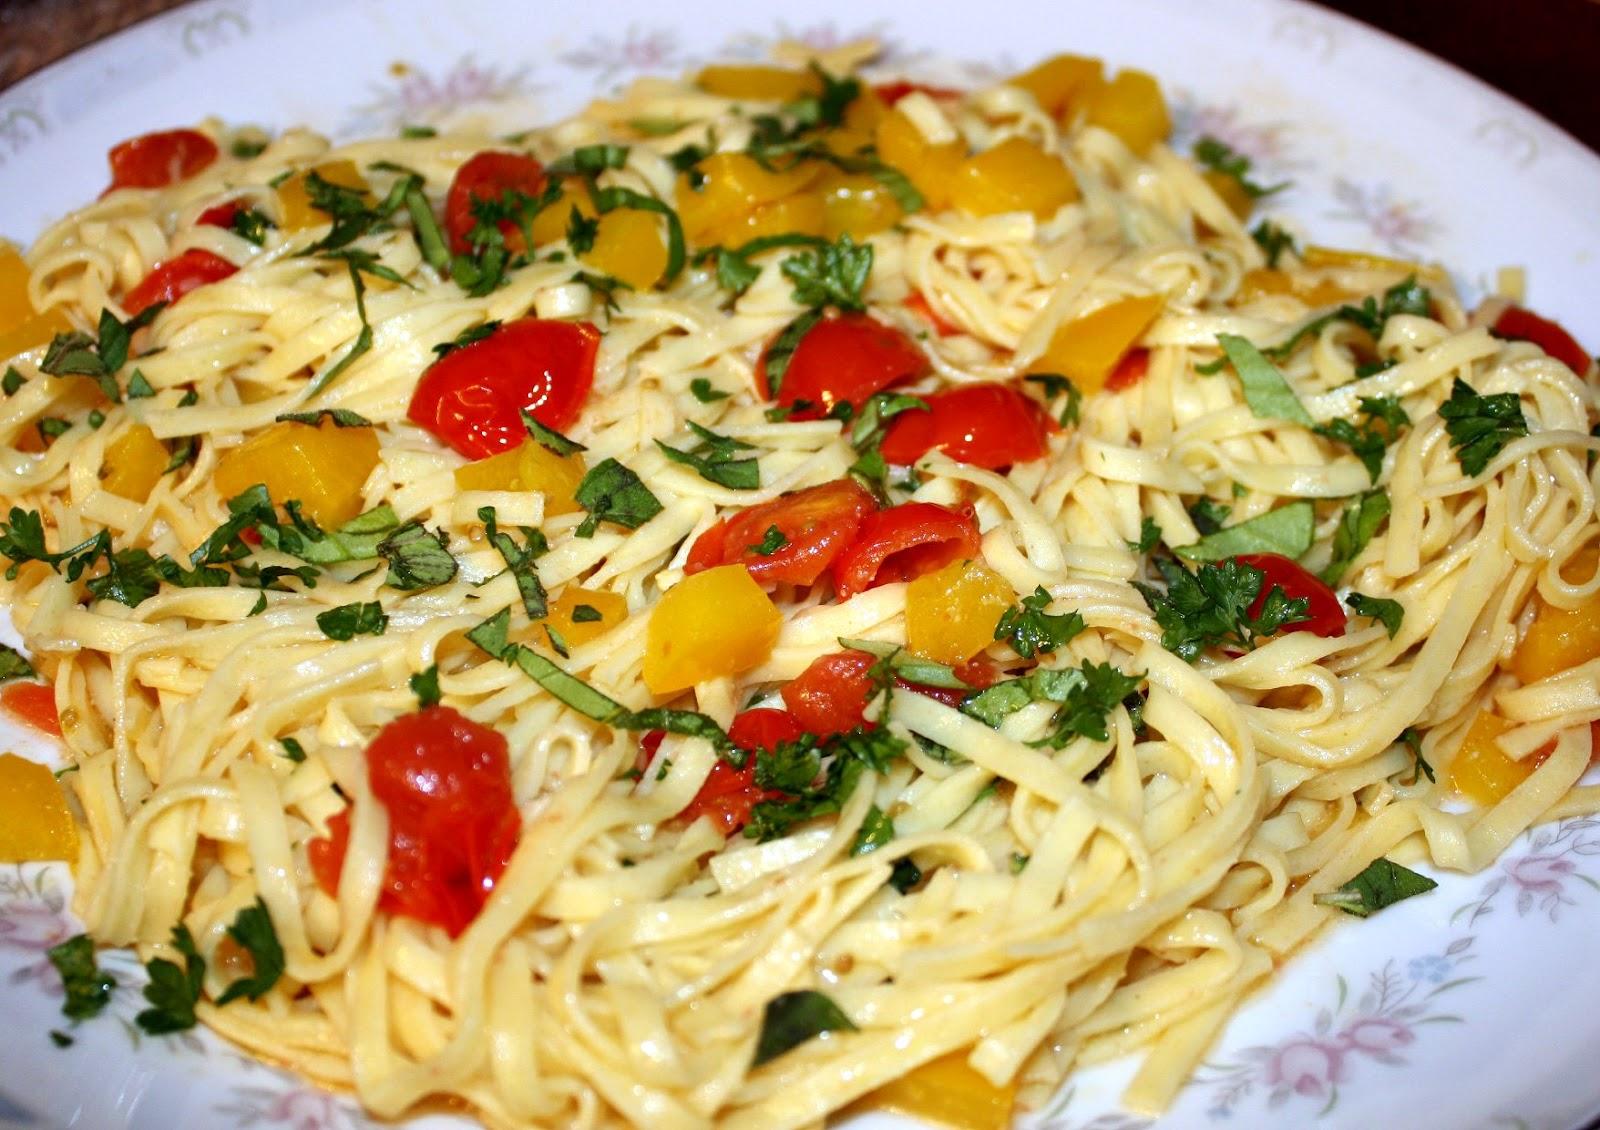 Herb Garden Hodgepodge Pasta Primavera Little Blog On The Internet